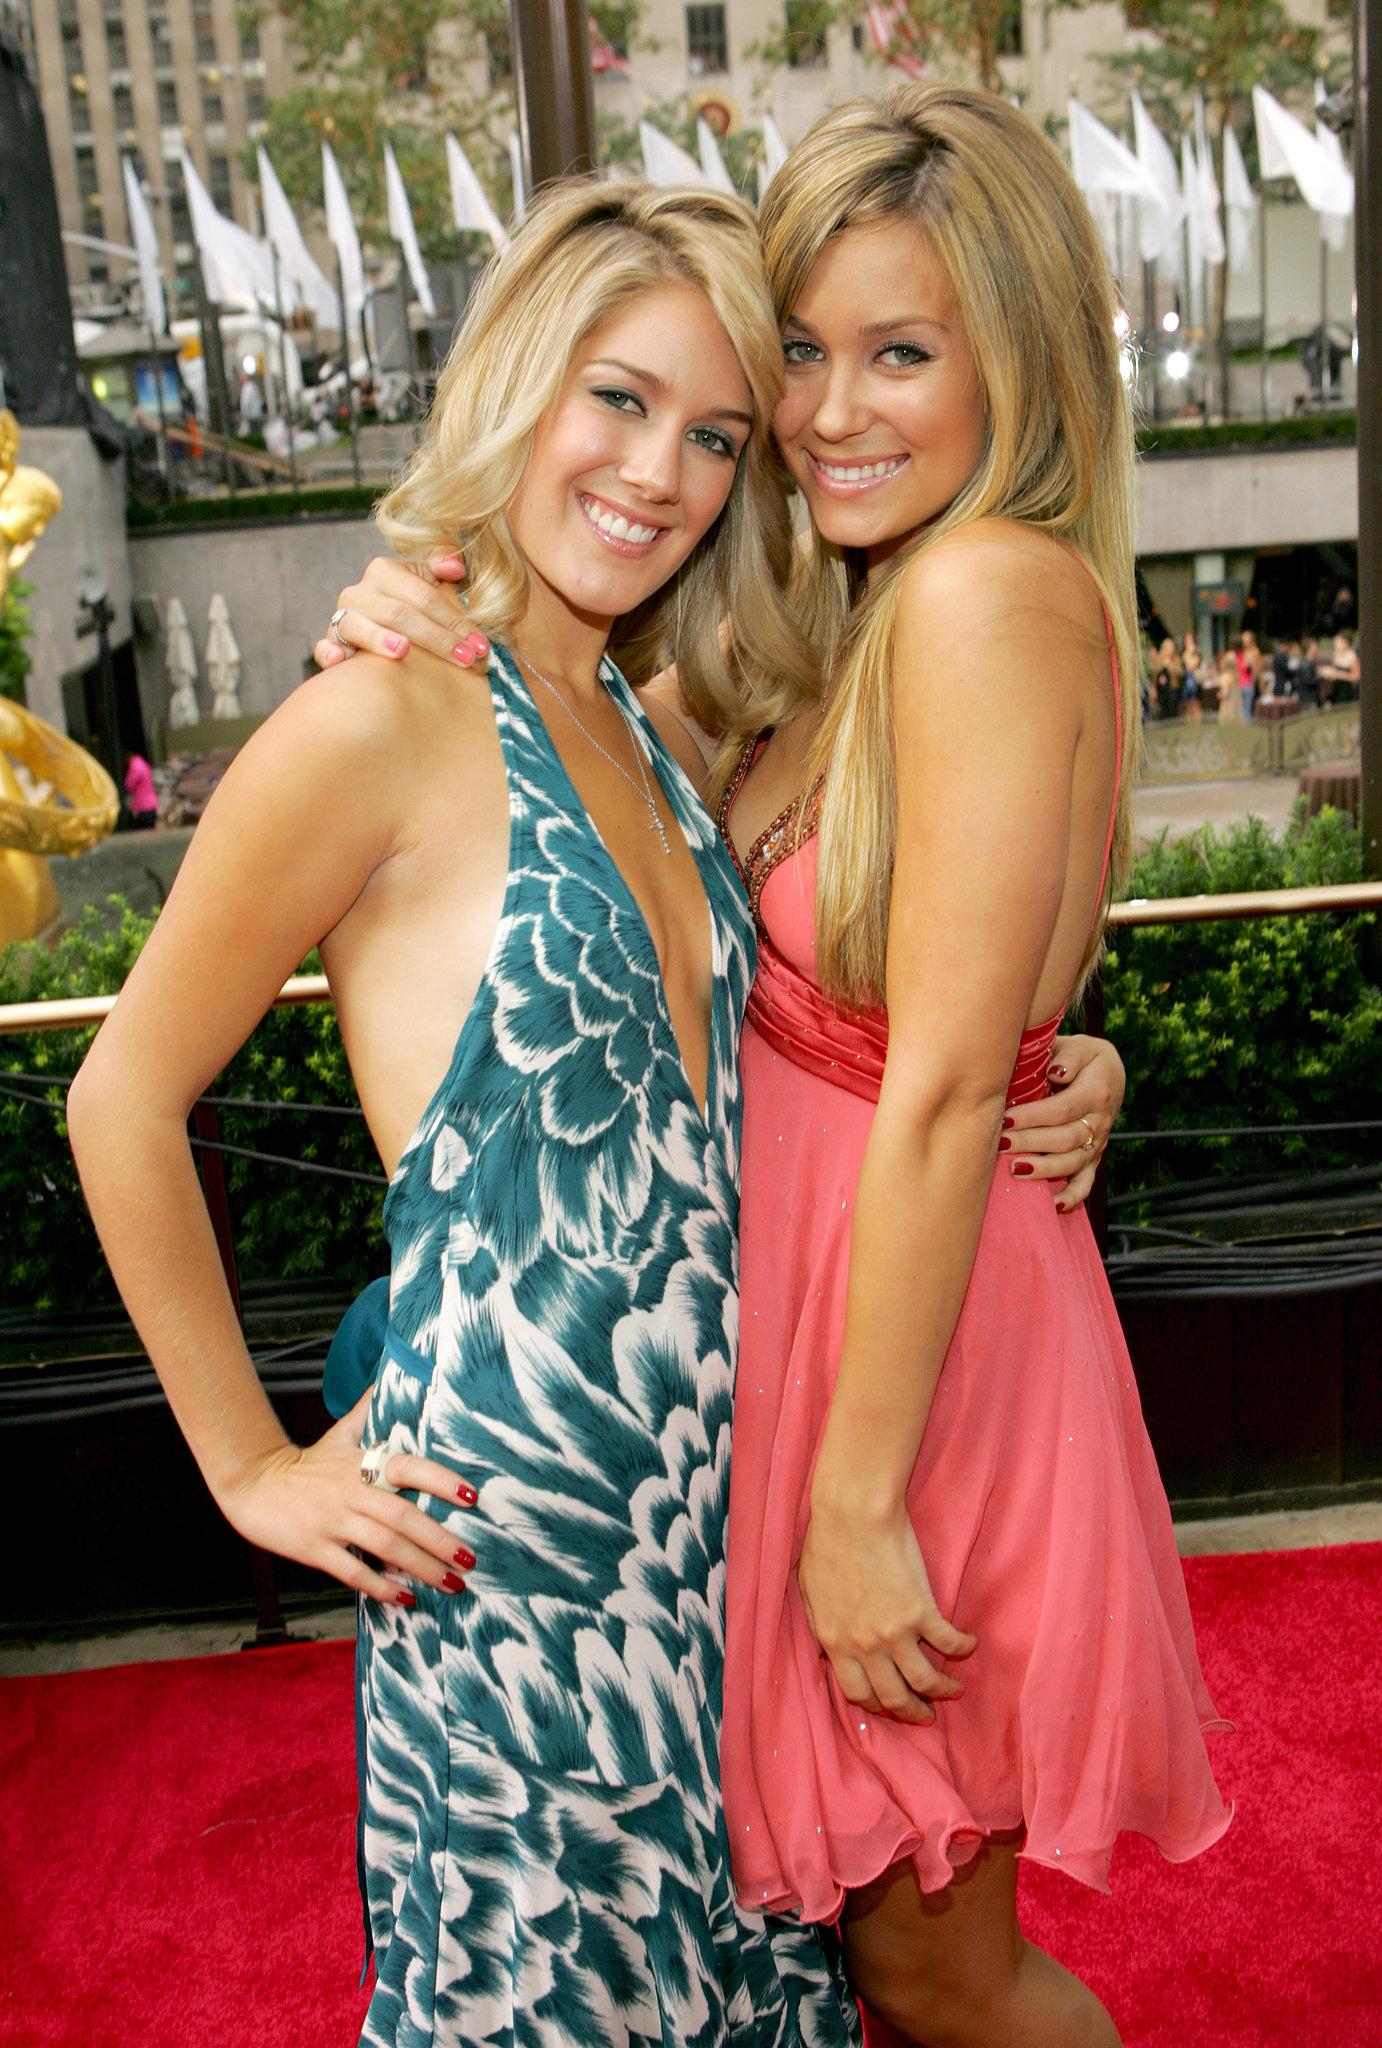 Heidi Montag and Lauren Conrad got cute on the 2006 MTV VMAs red carpet.